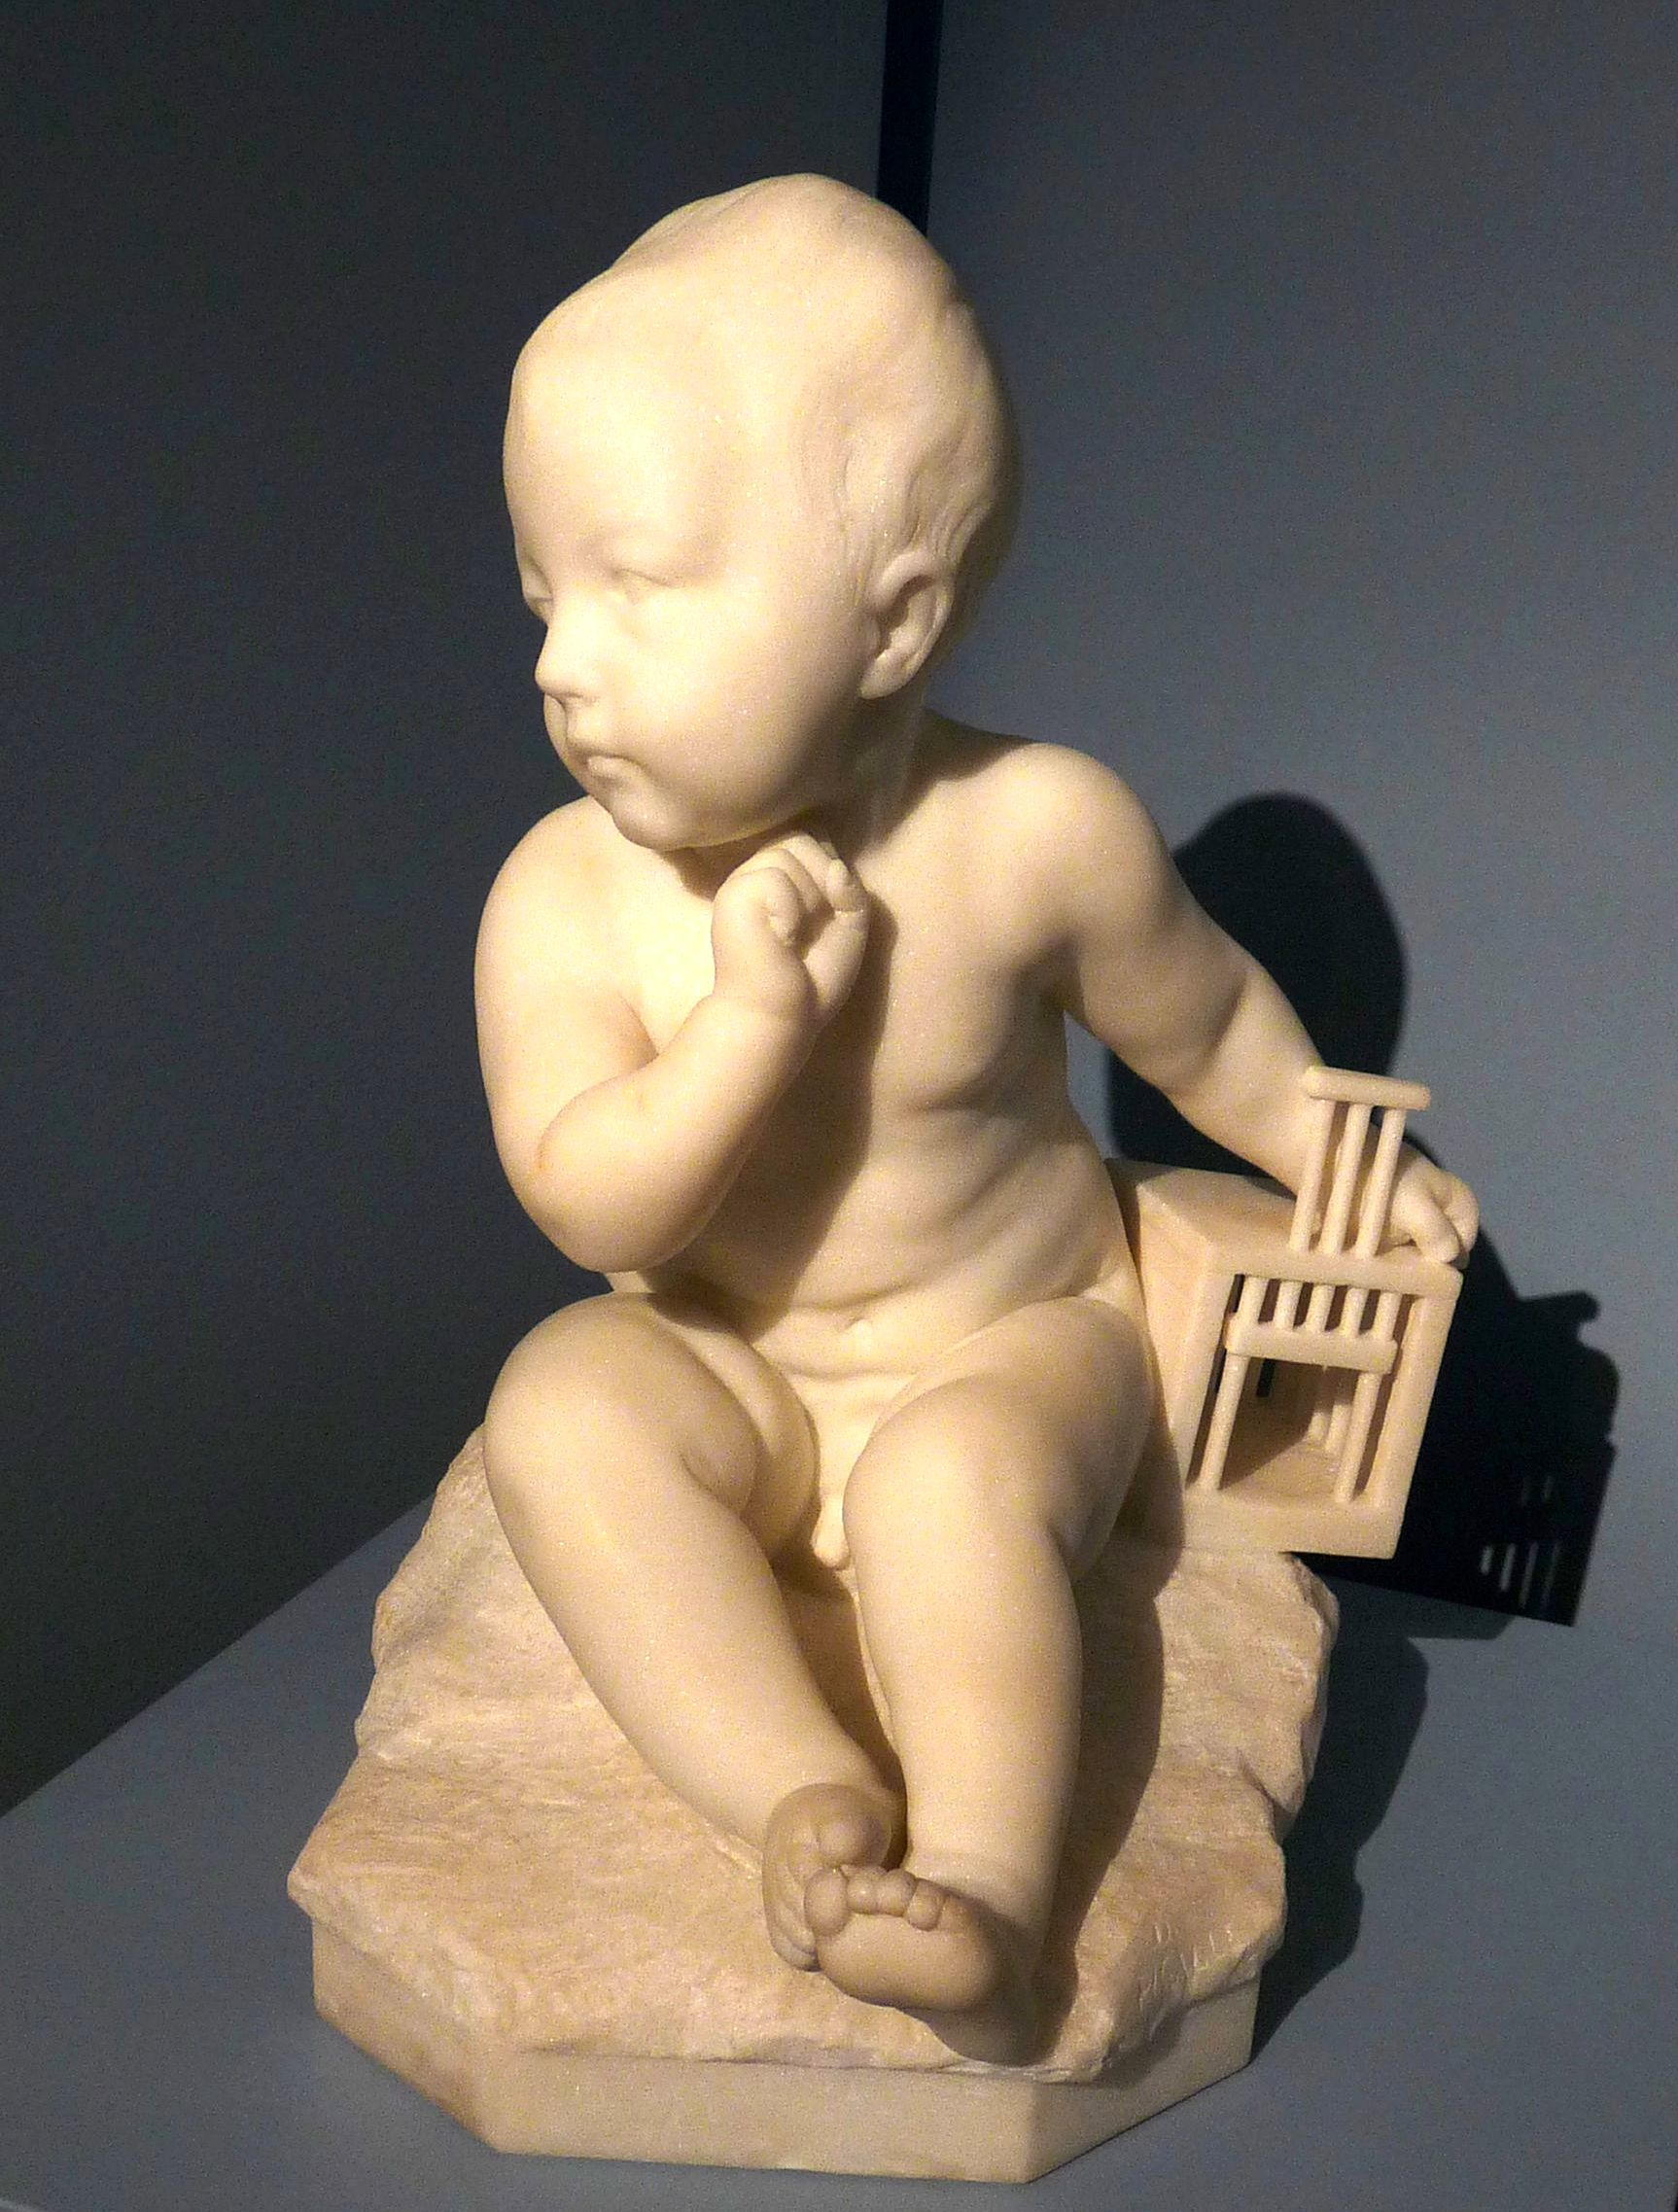 08a_170303_Brunoy_Musee_Dubois-Corneau_P1330105_JFMARTINE